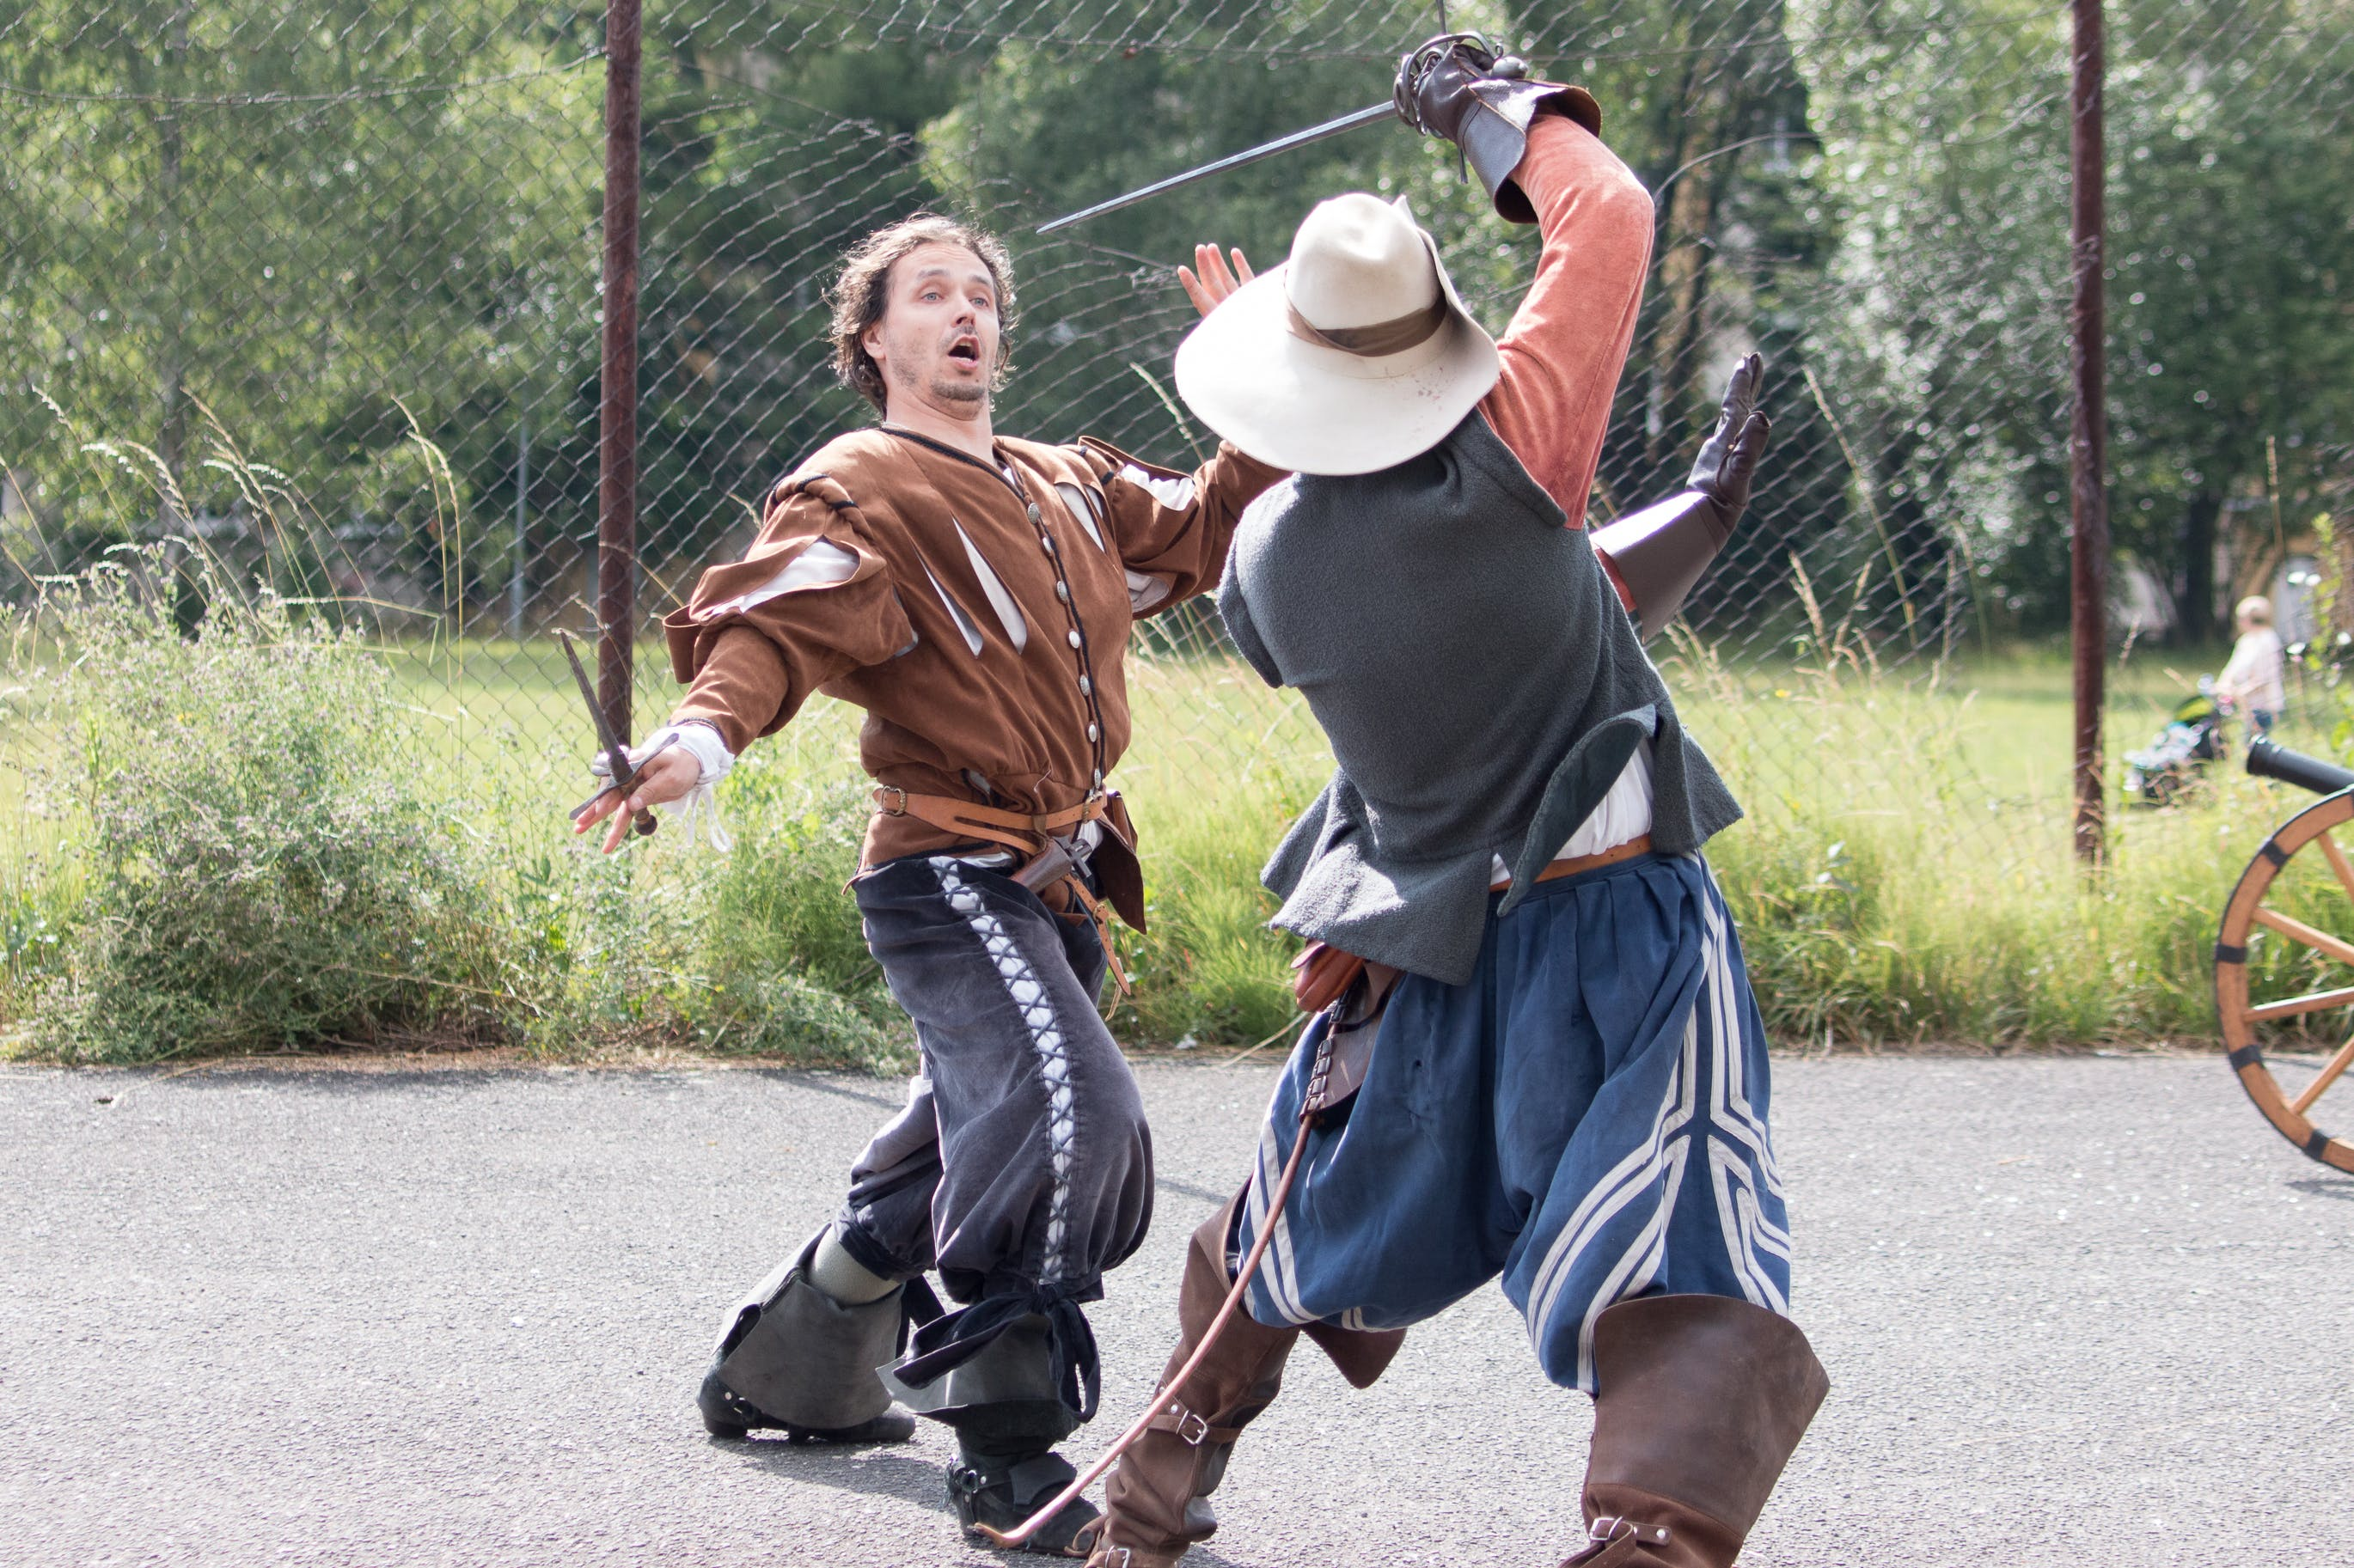 Free stock photo of swordplay